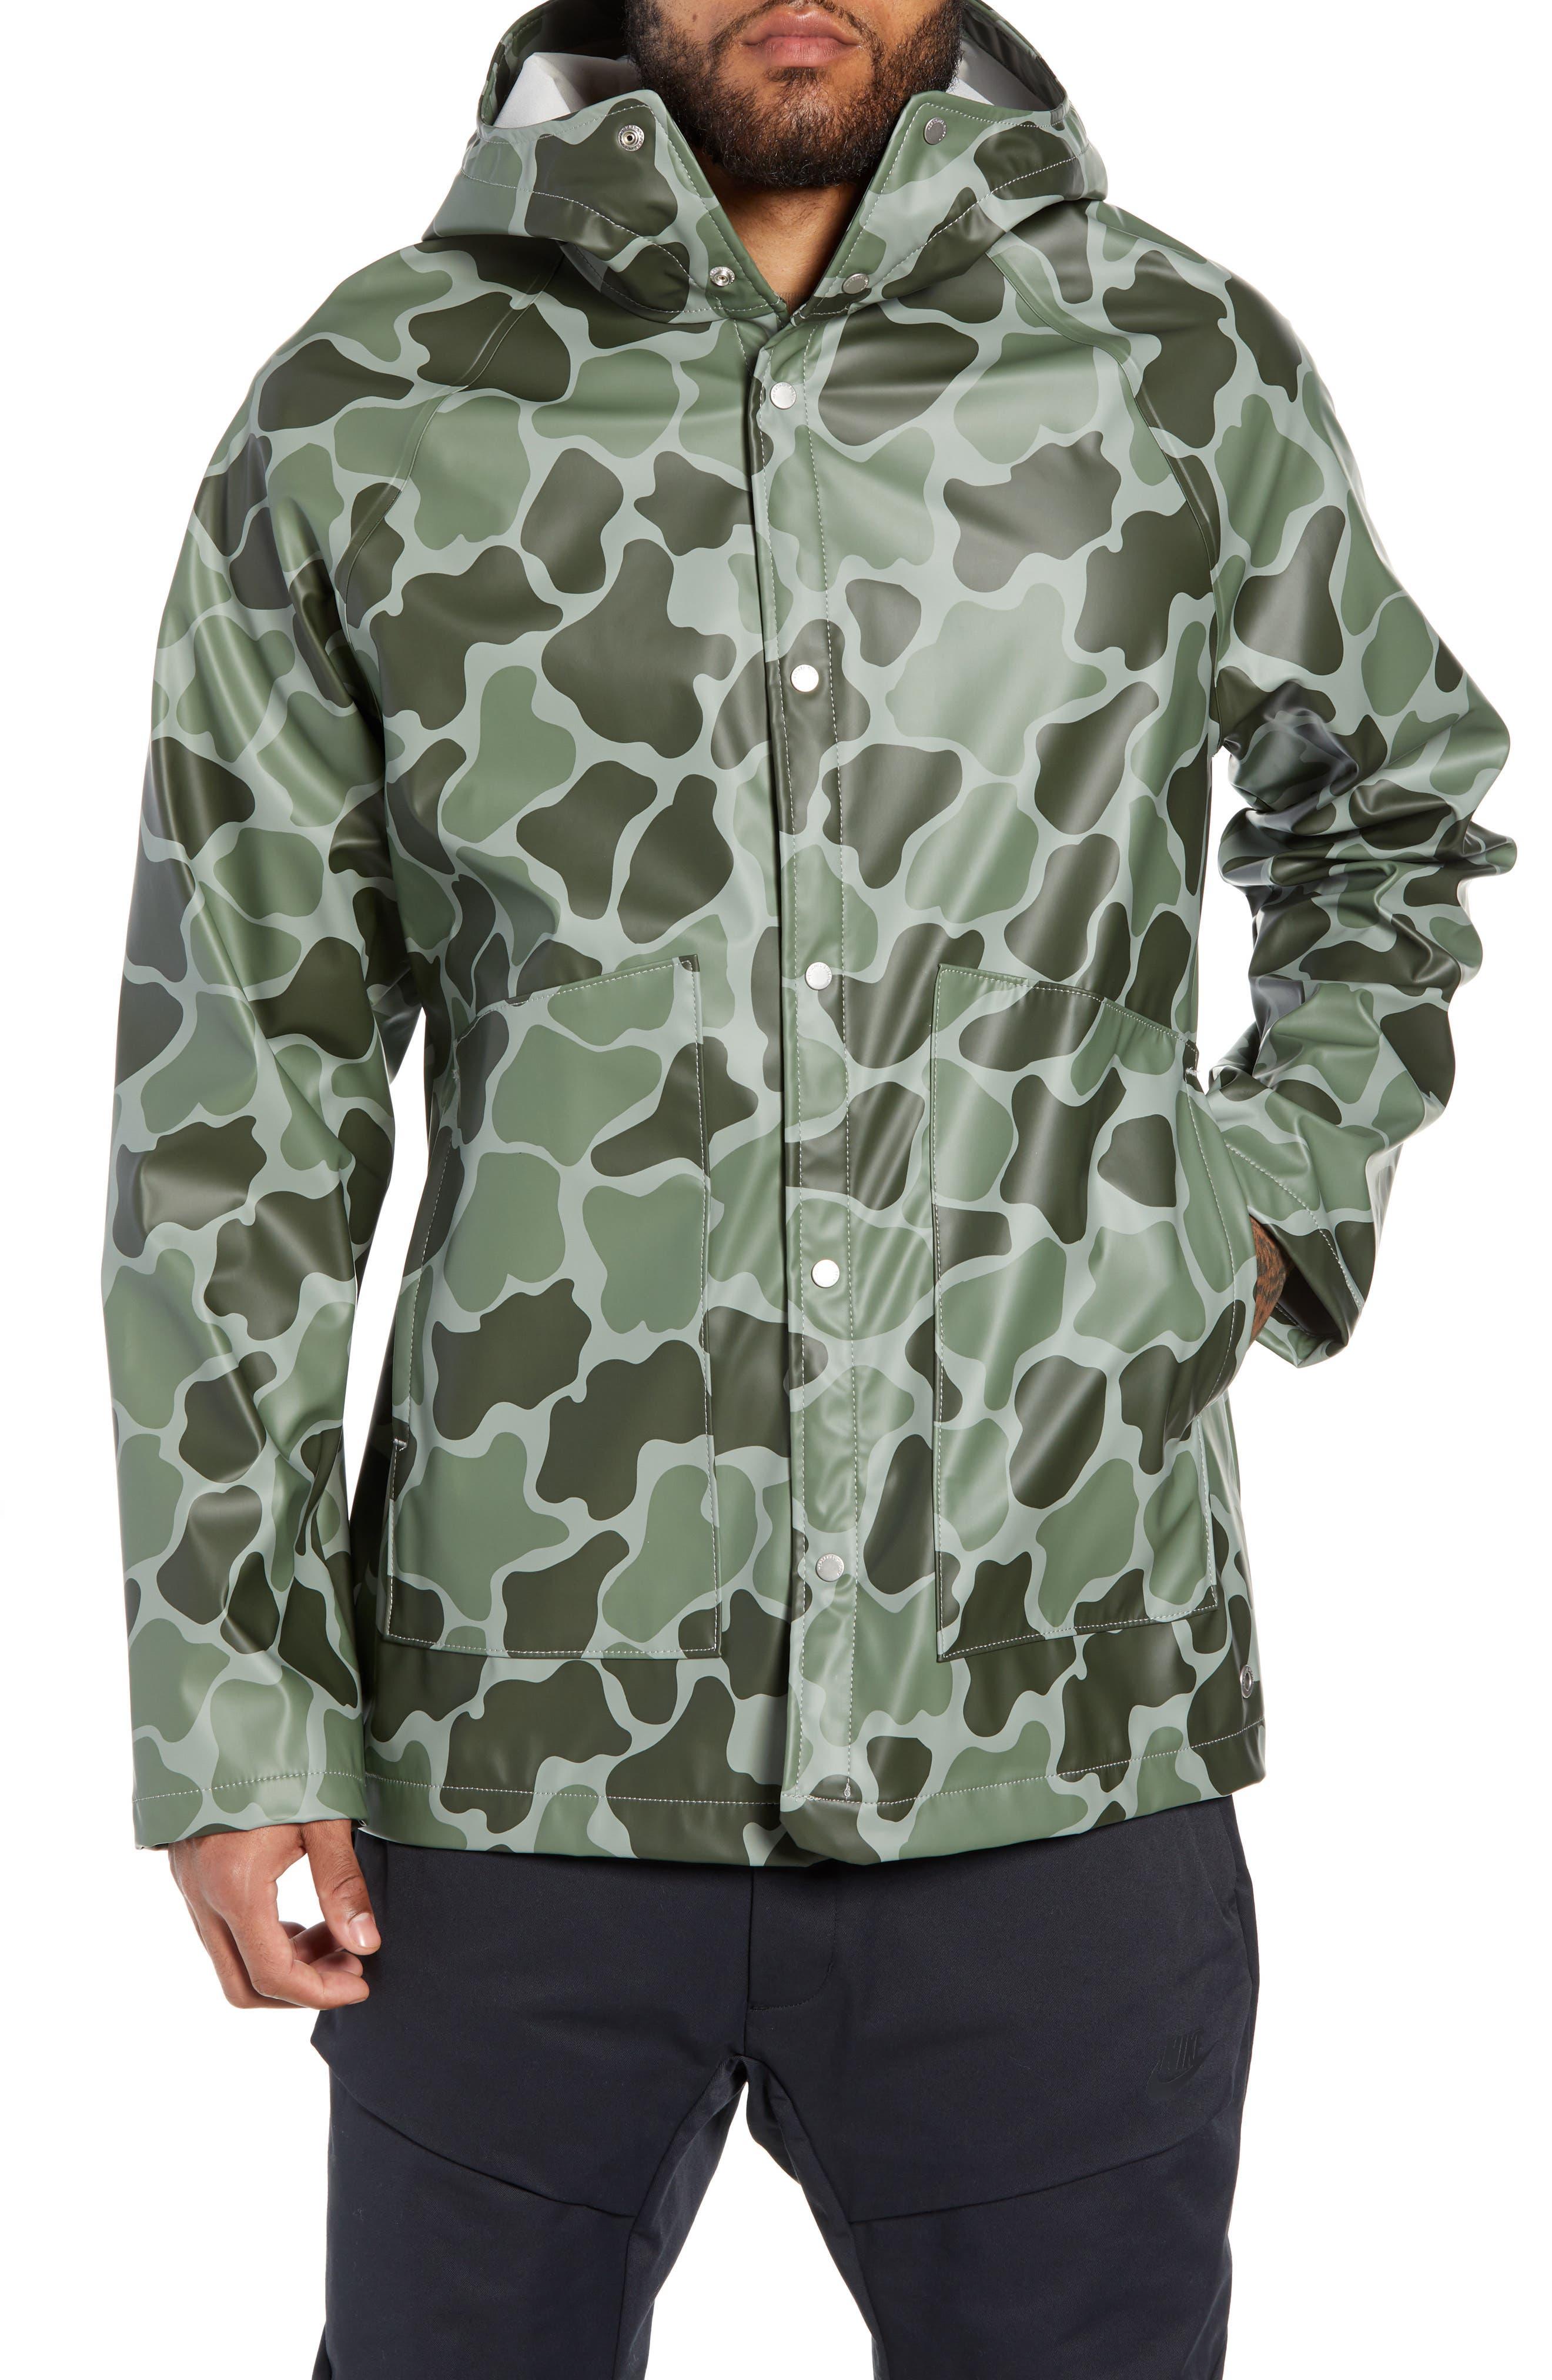 Herschel Supply Co. Classic Hooded Rain Jacket, Green